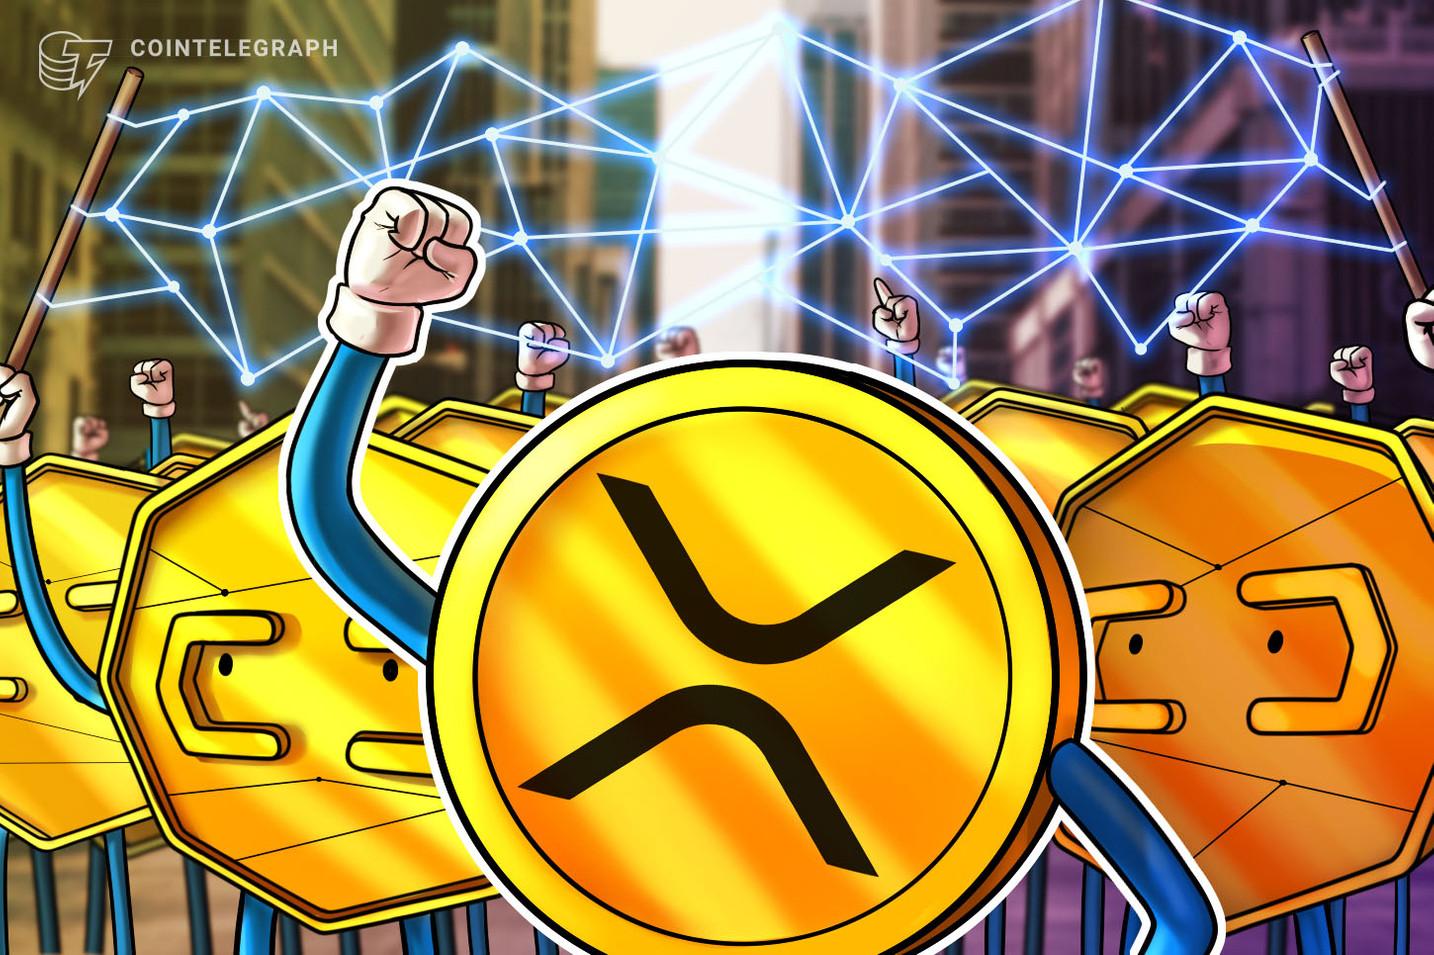 XRP price must break this key resistance to regain bullish momentum